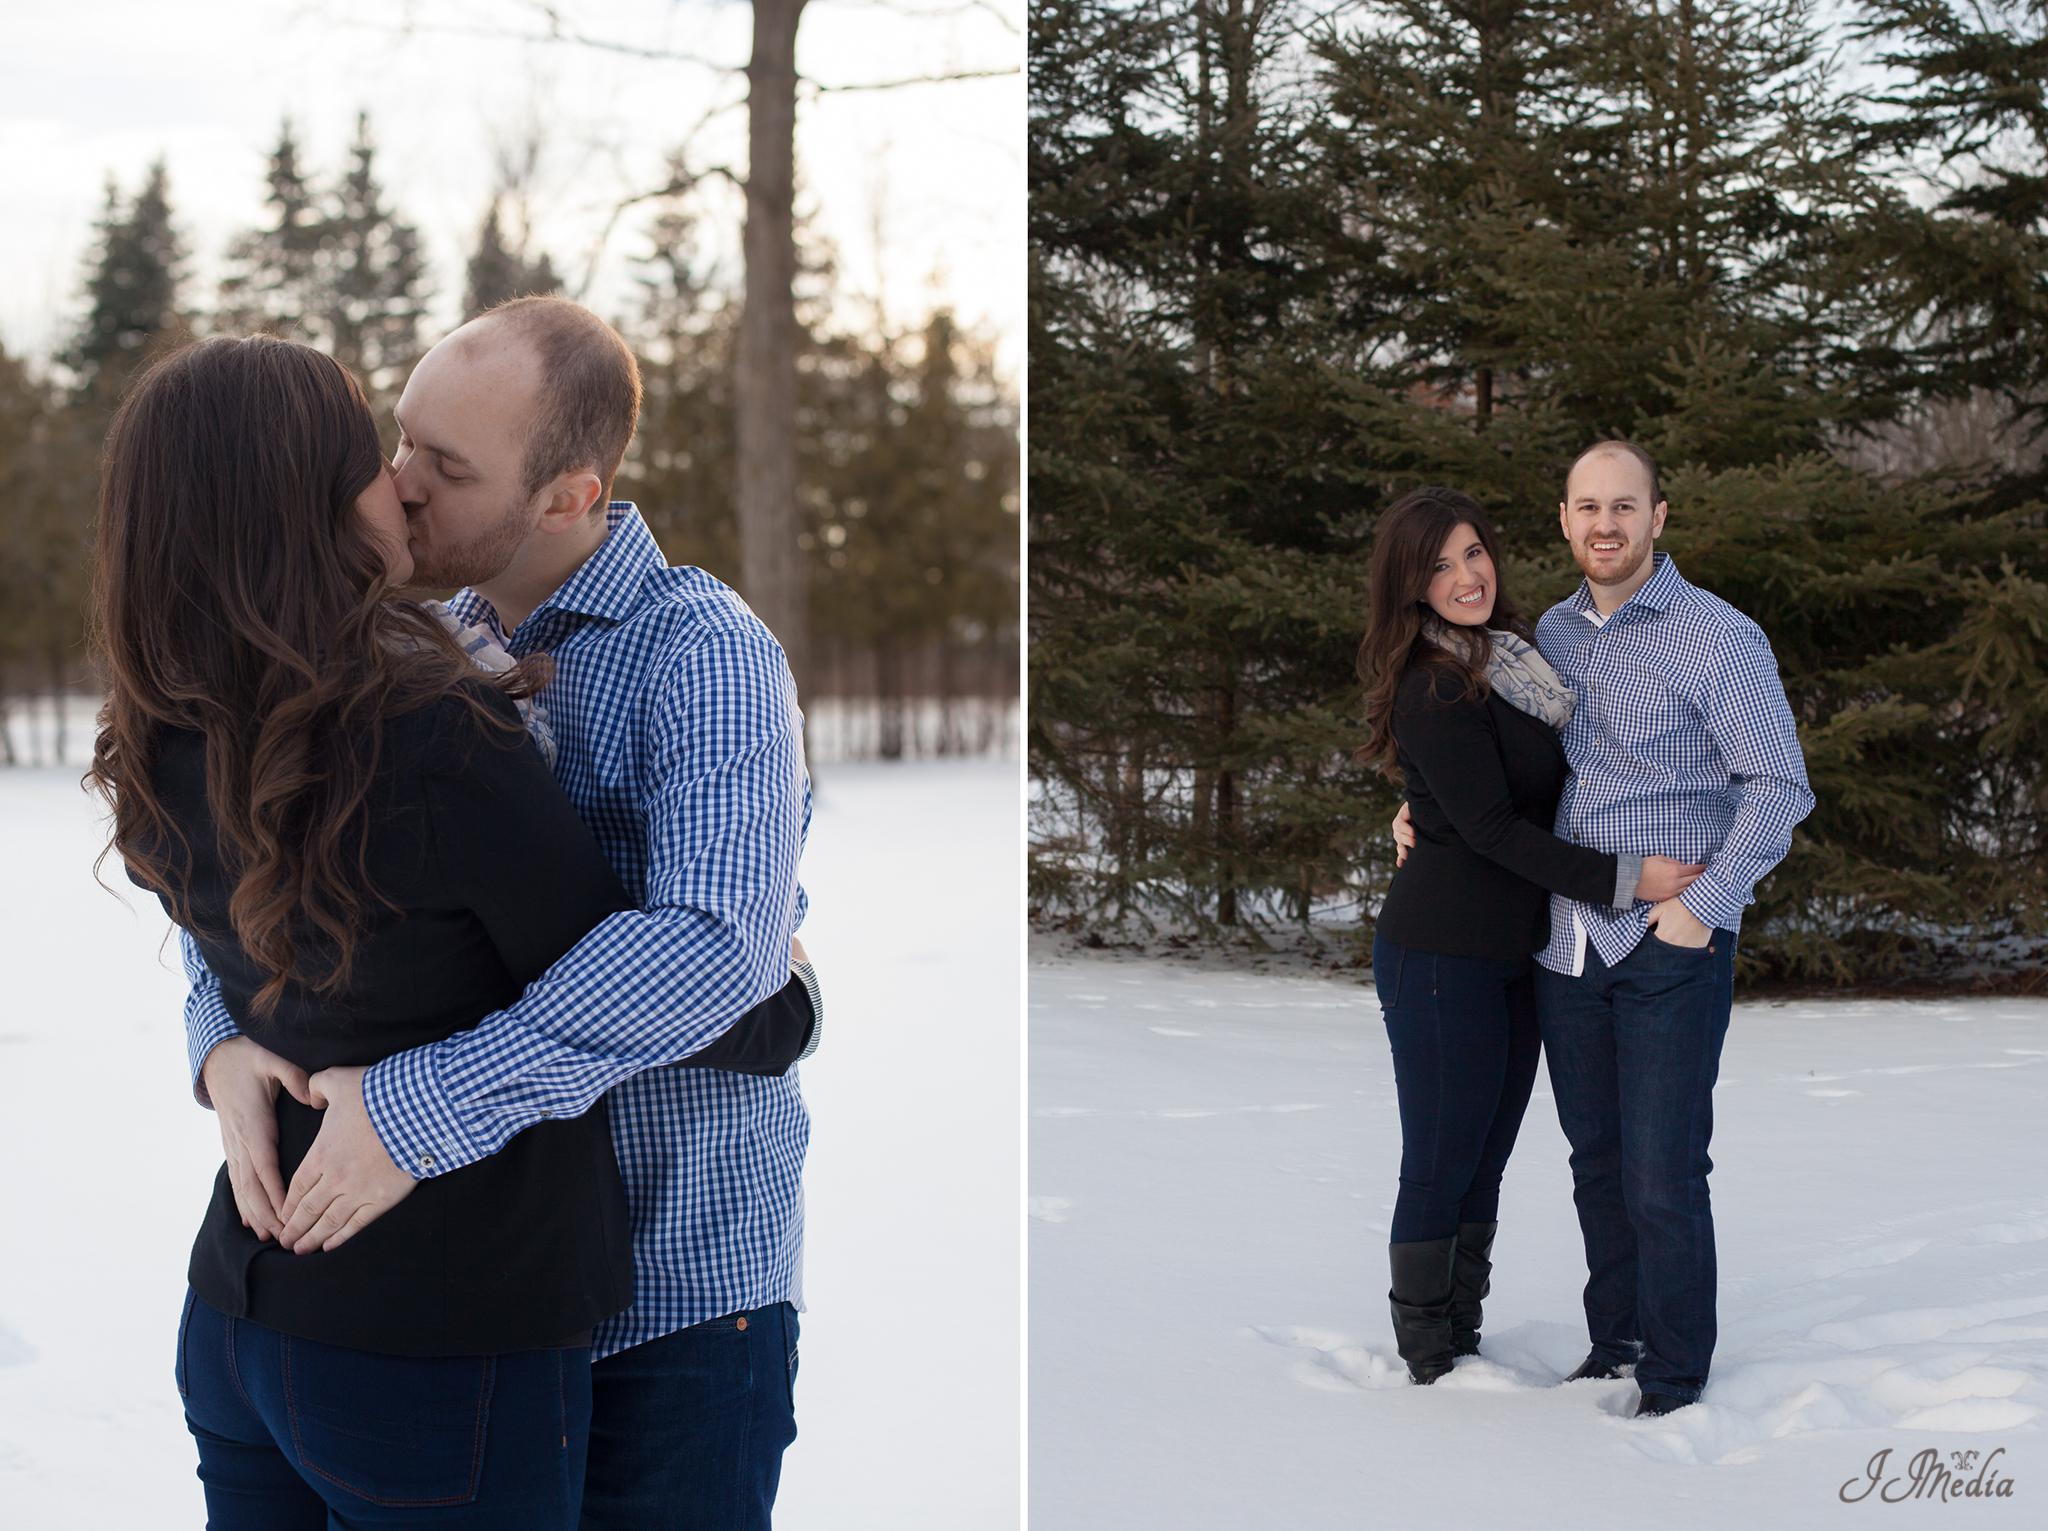 Winter-Engagement-Photos-JJMedia-19